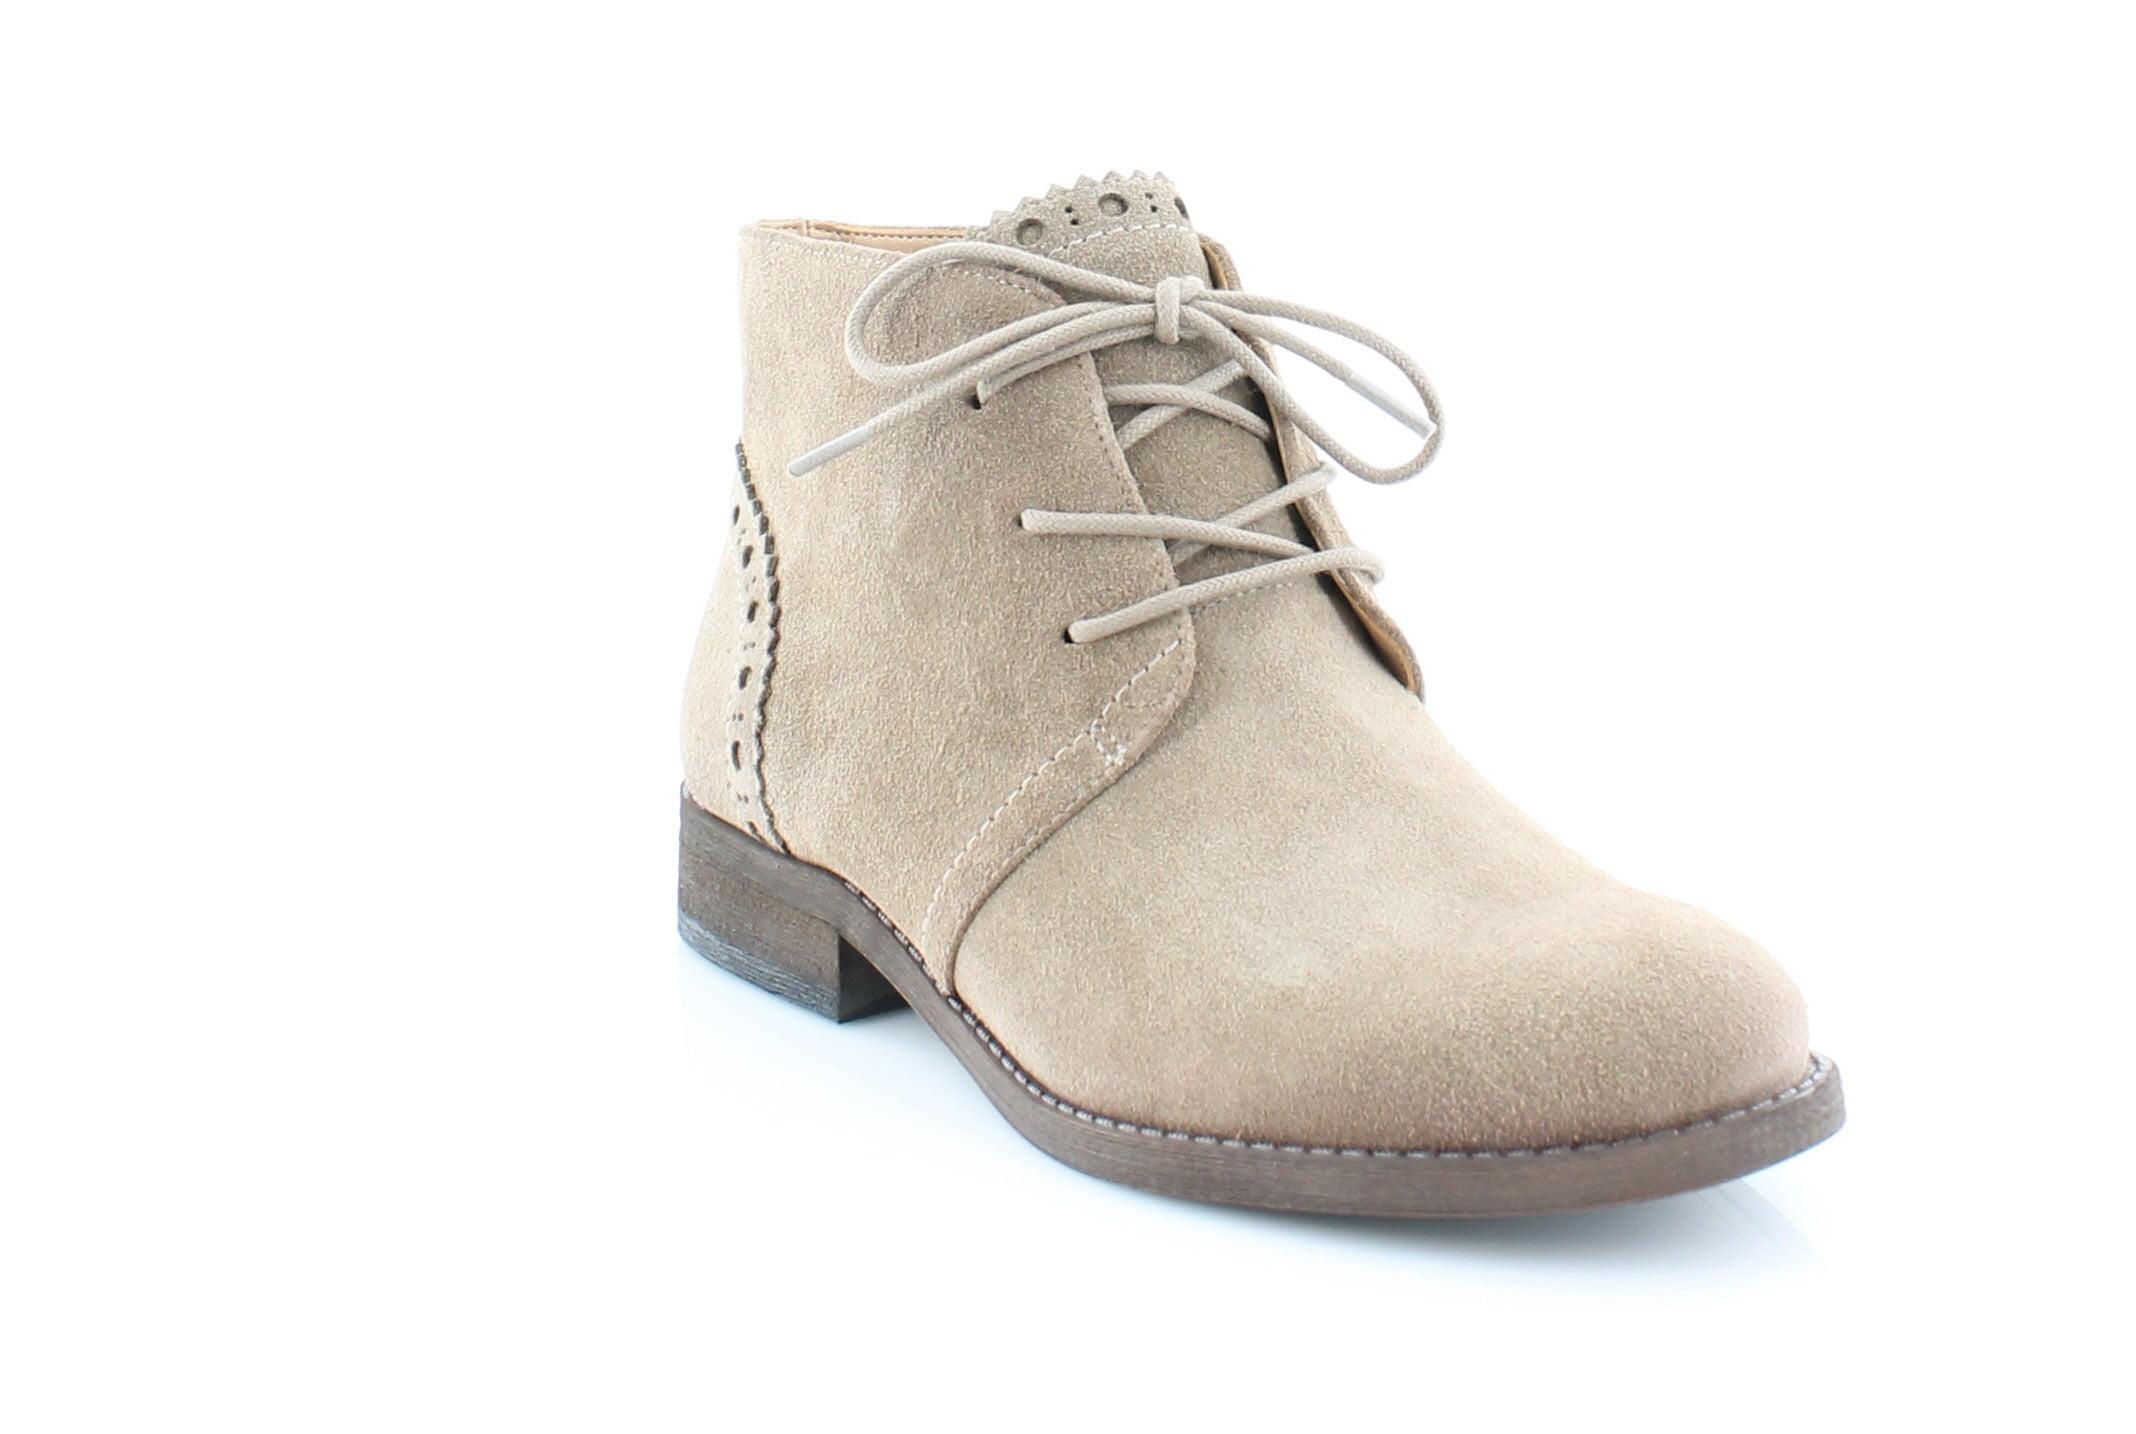 Franco Sarto Heathrow Women's Boots by